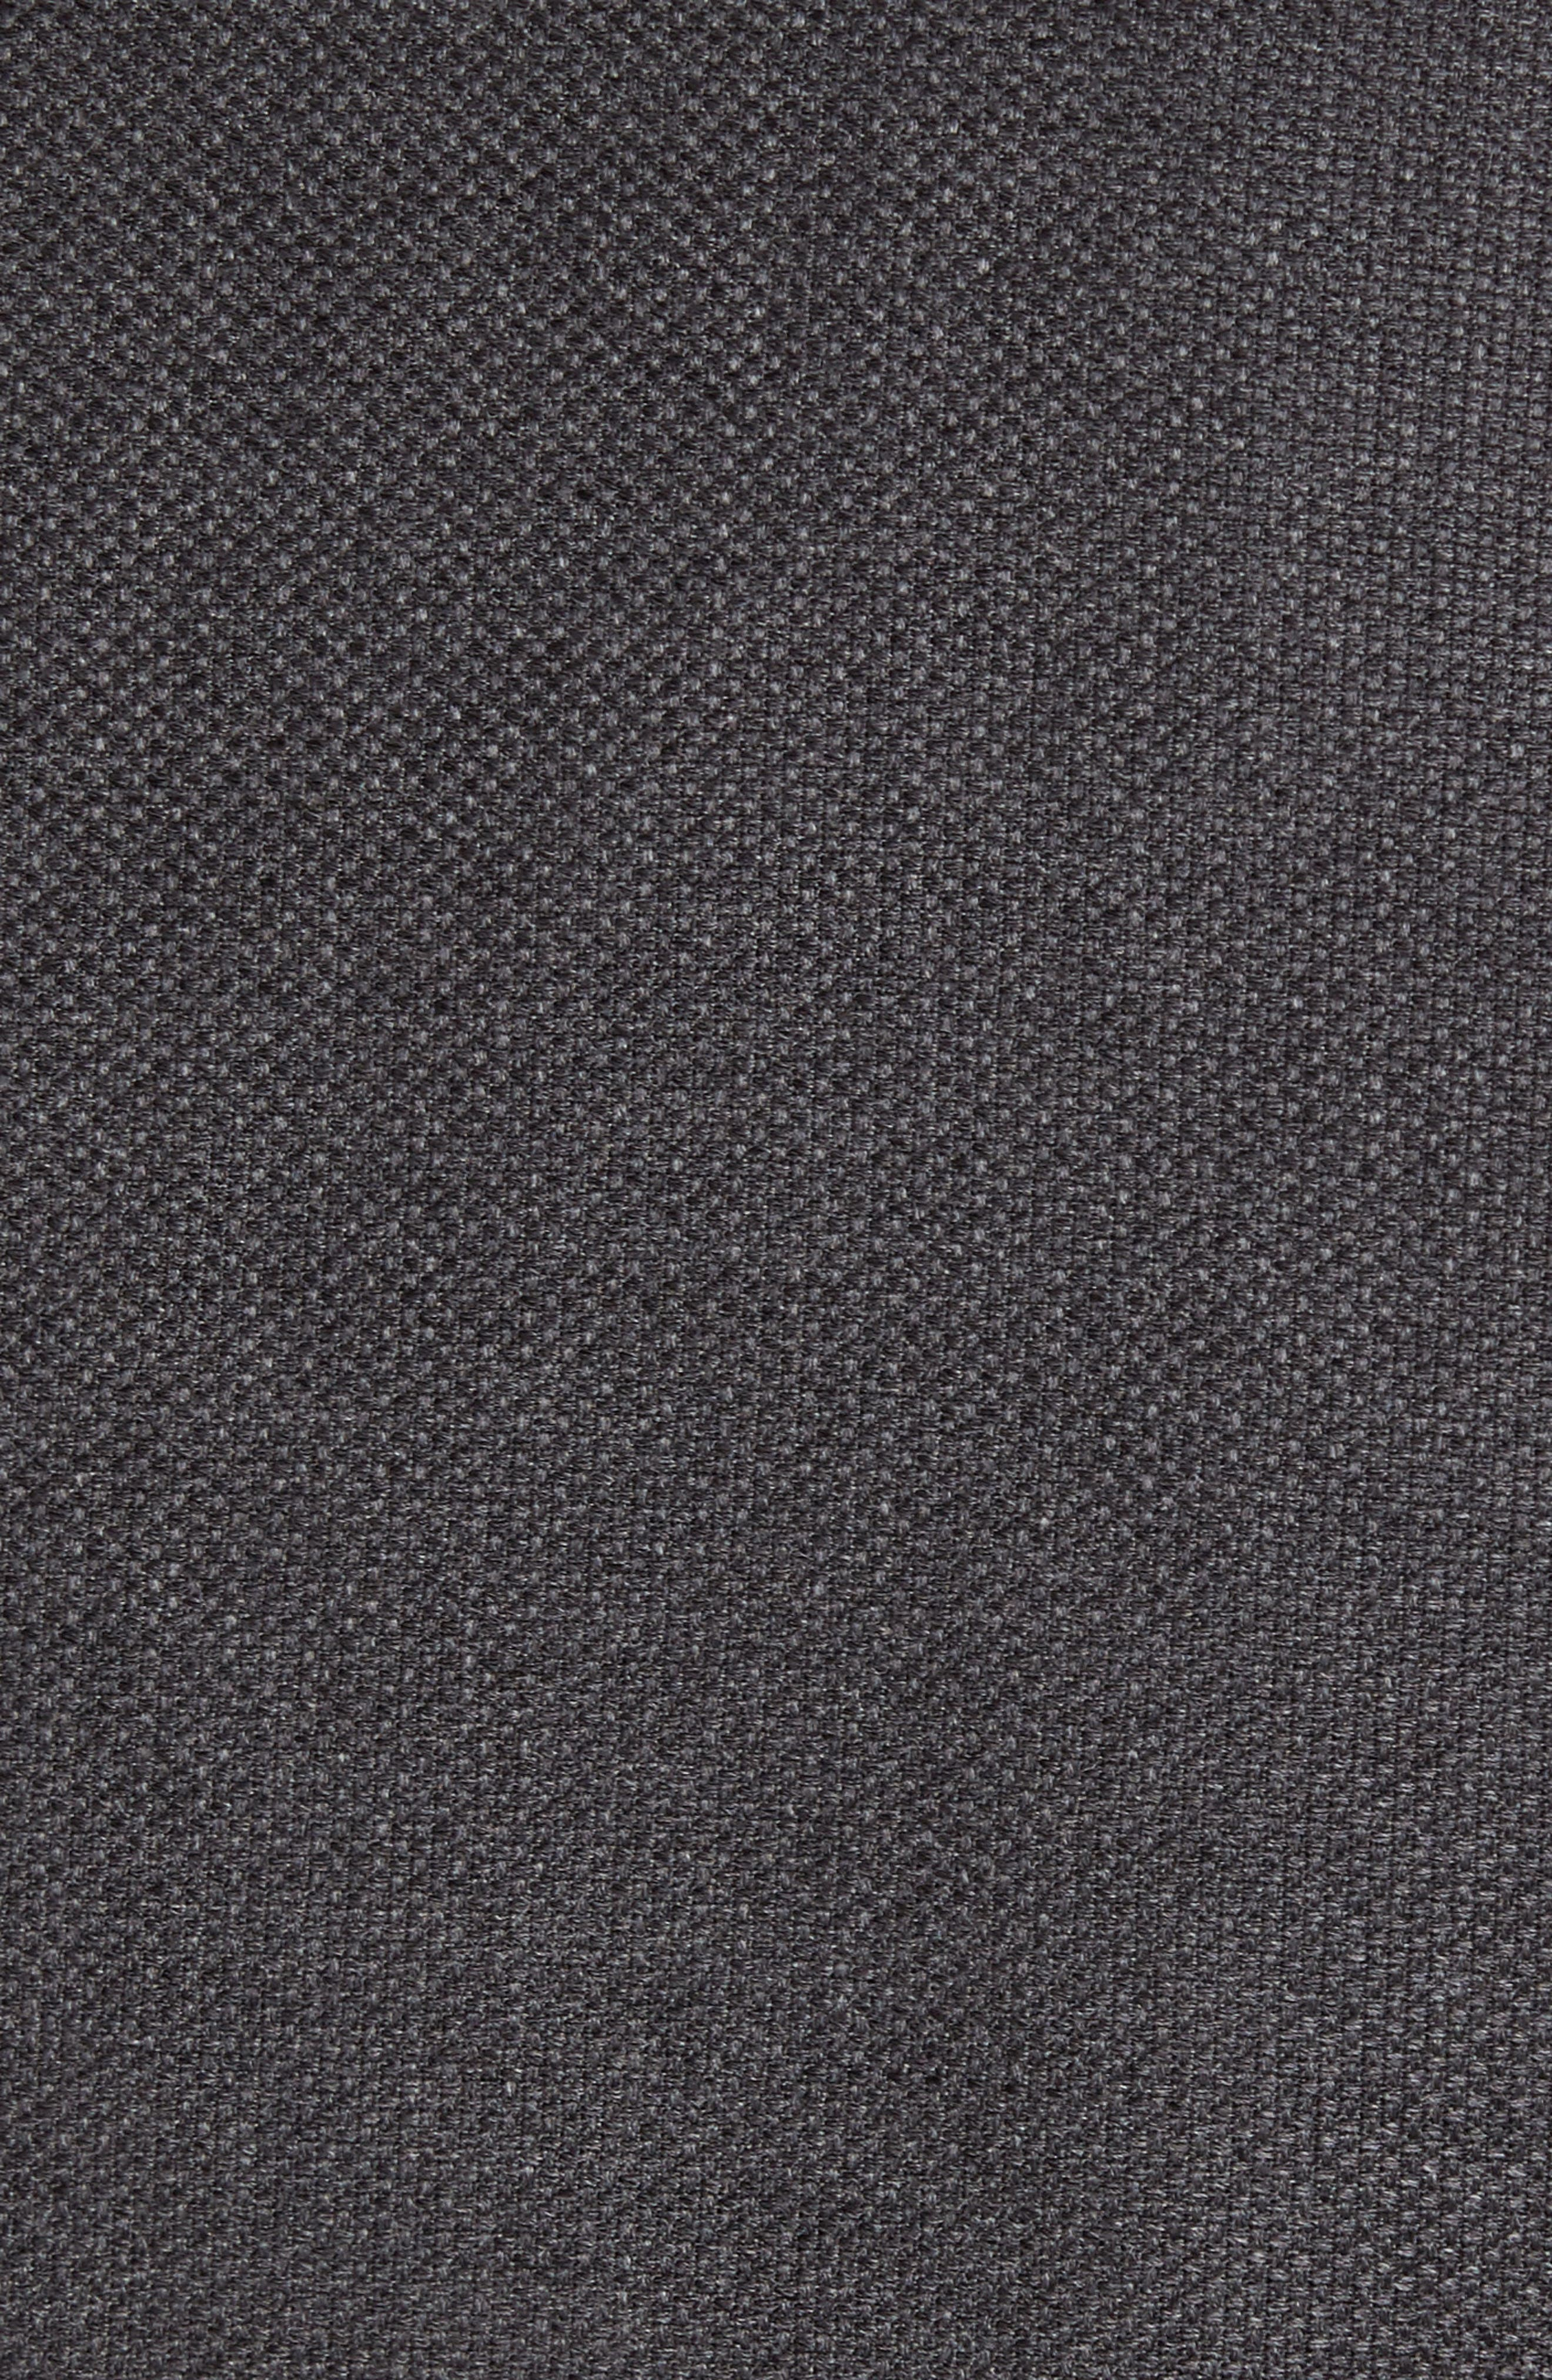 Trim Fit Wool Blazer,                             Alternate thumbnail 6, color,                             024